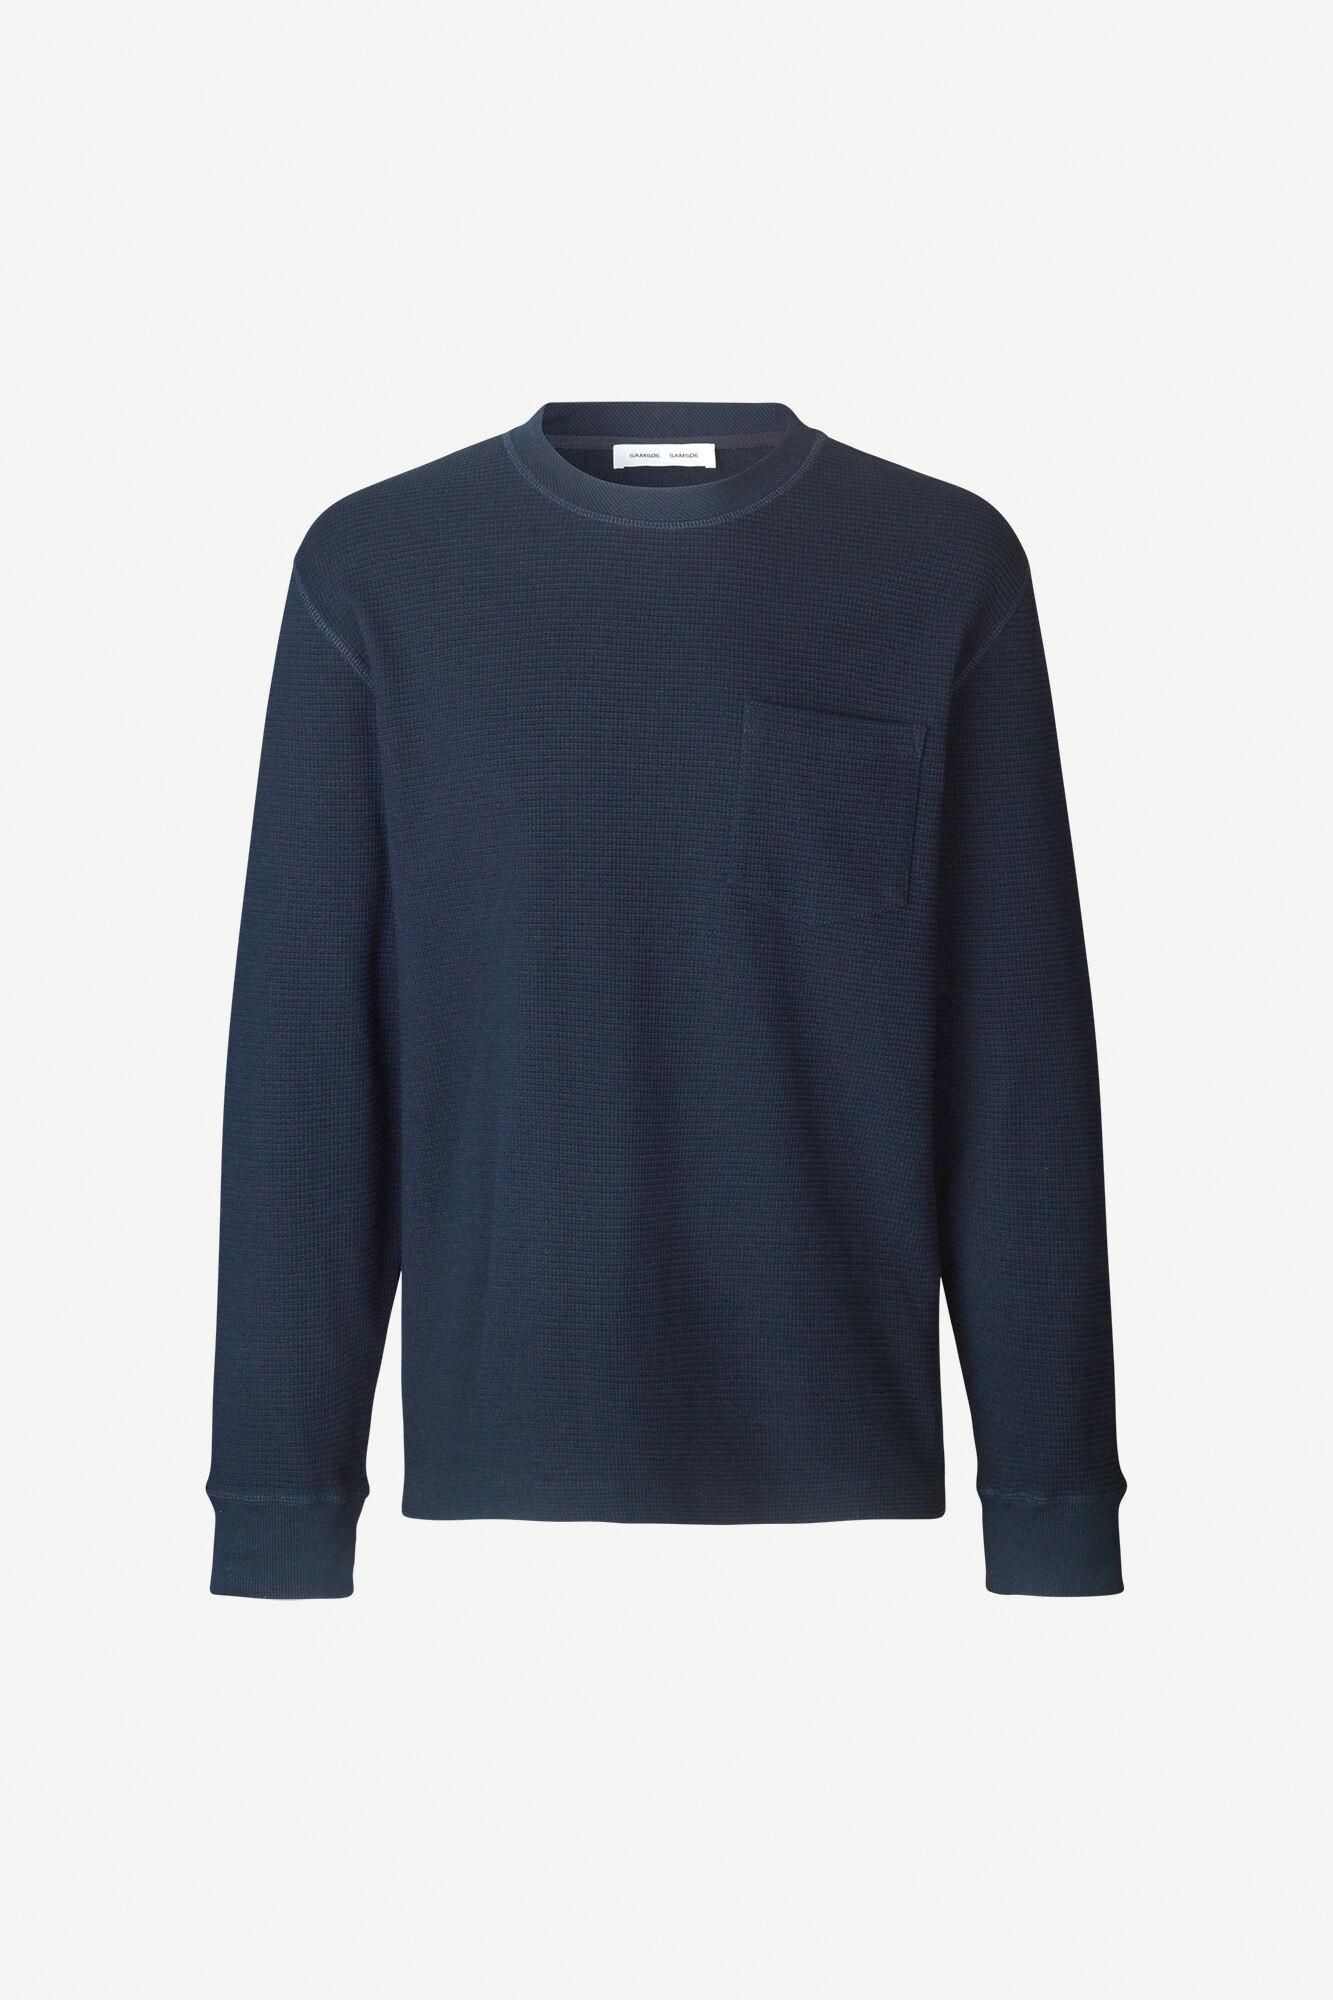 Adhil Box Fit Longsleeve T-Shirt Sky Blue 11696-1